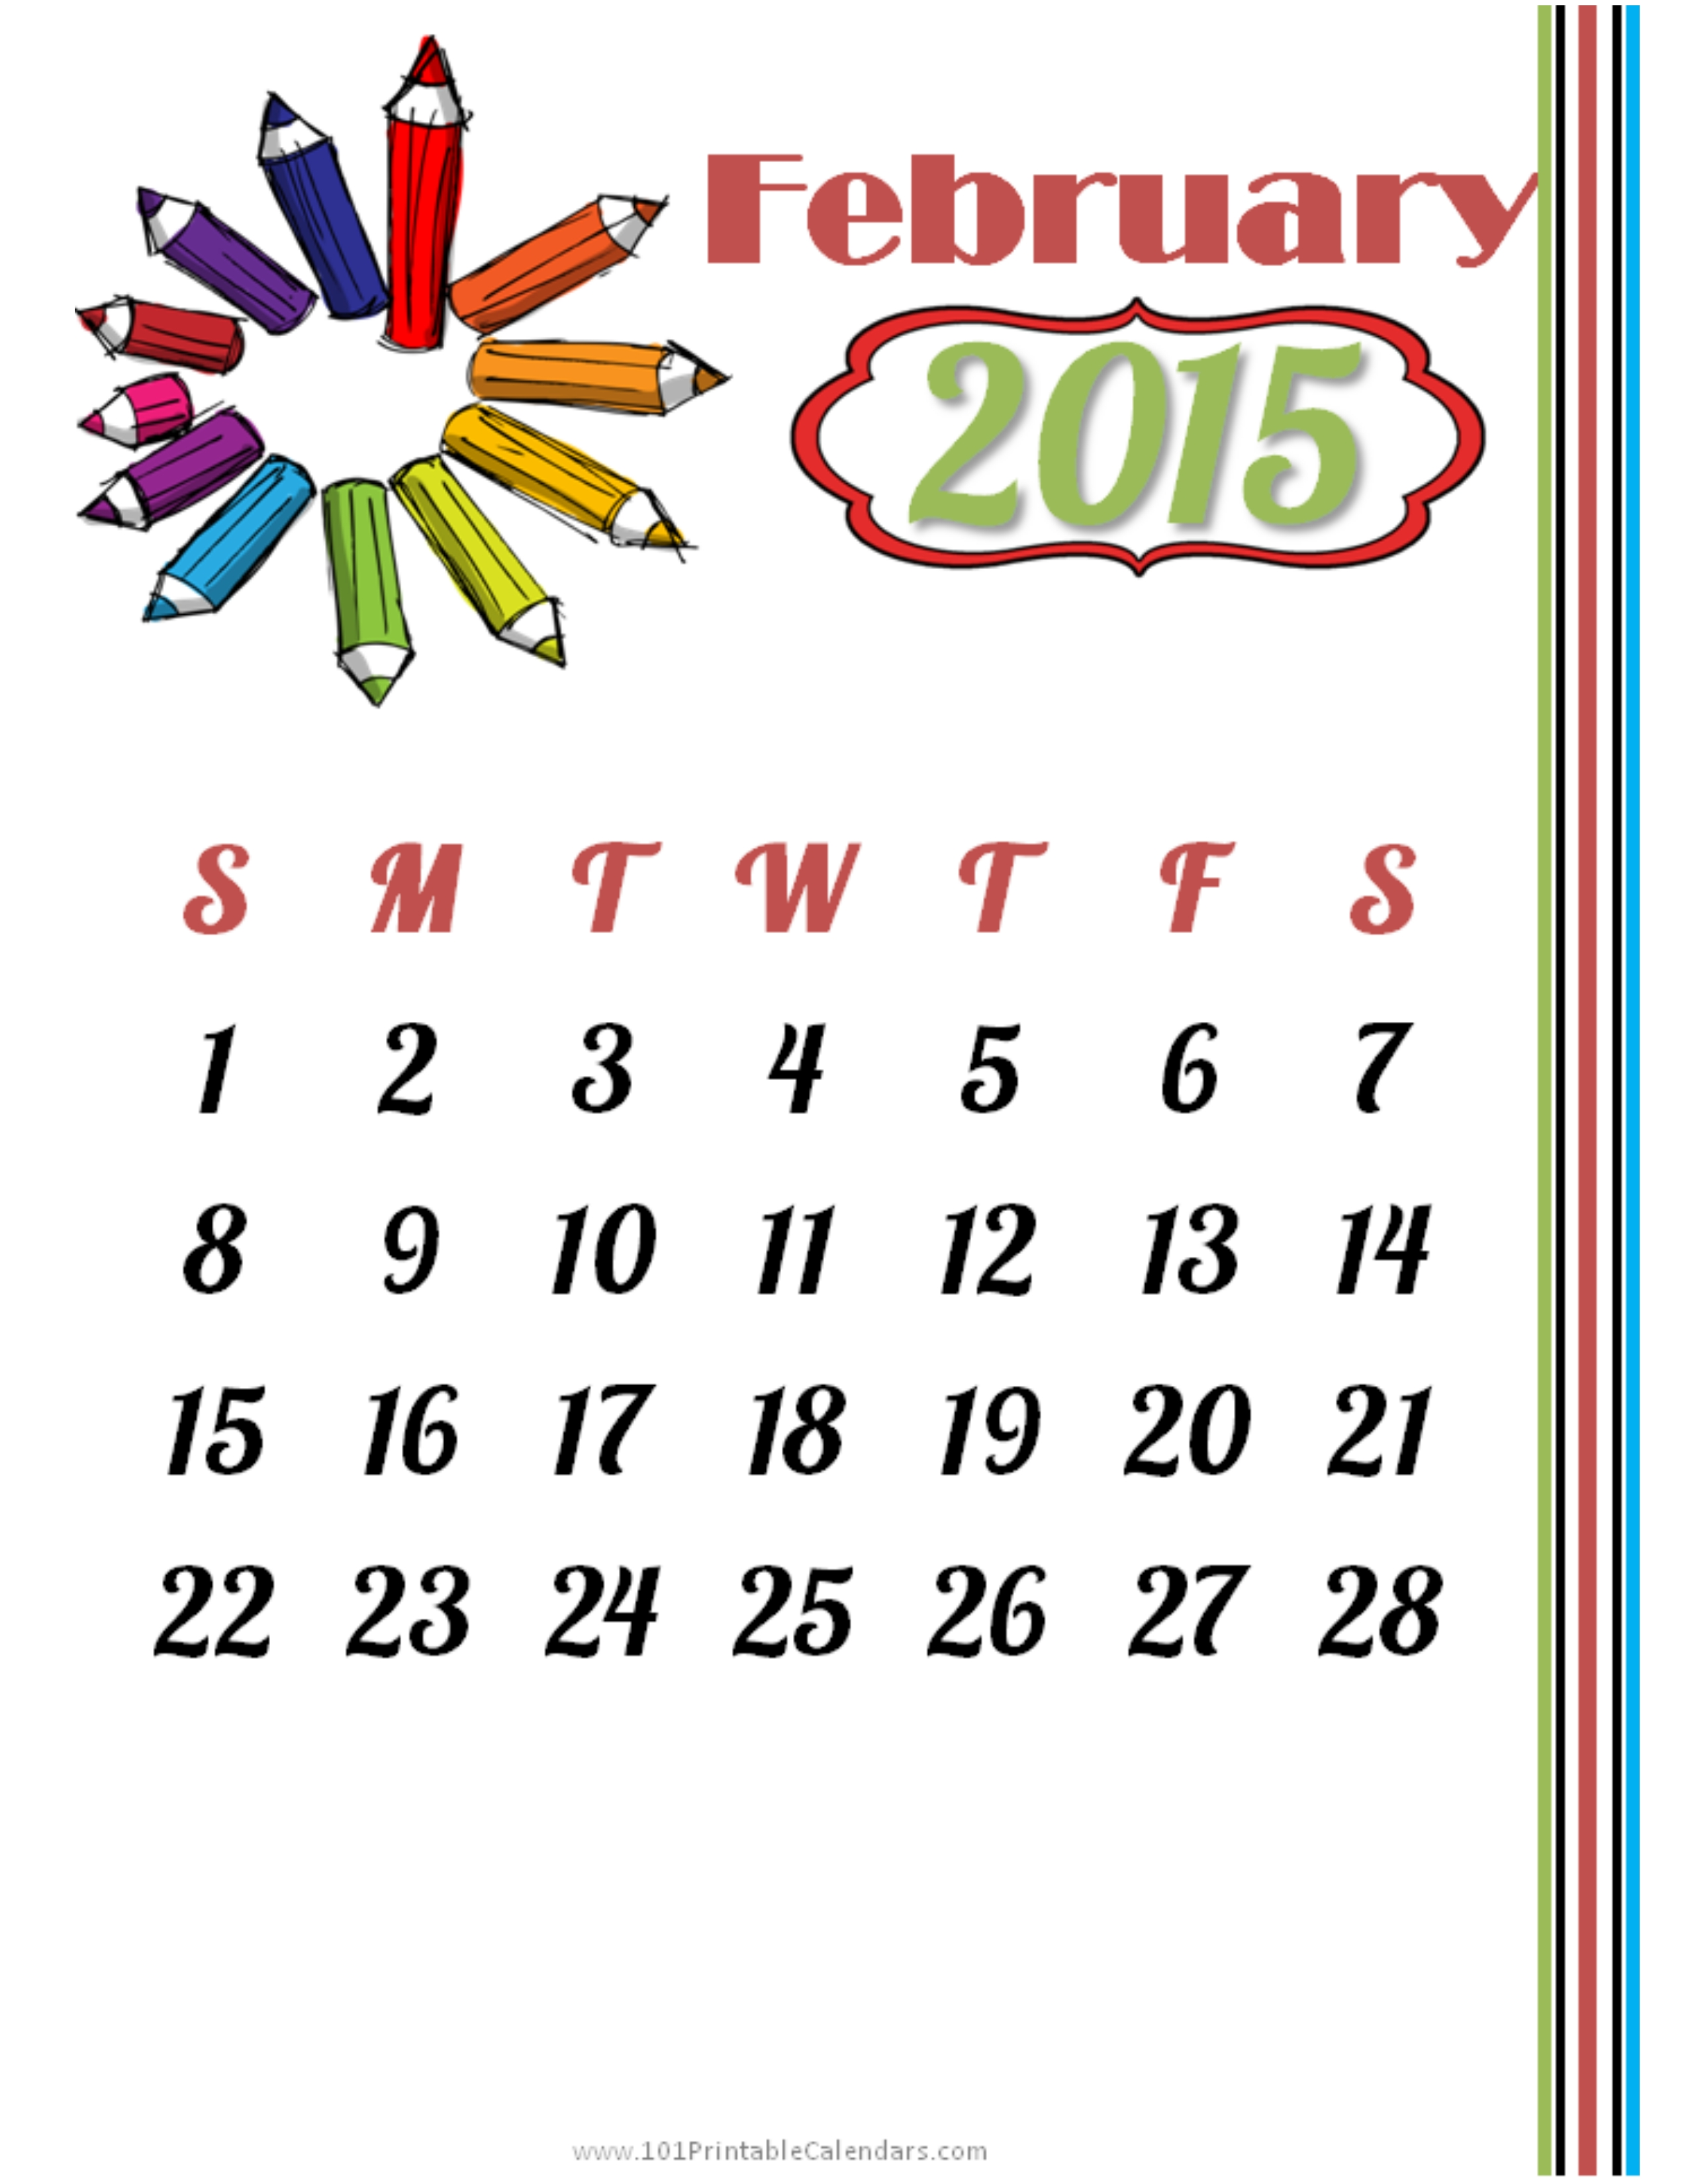 February 2015 Calendar Printable